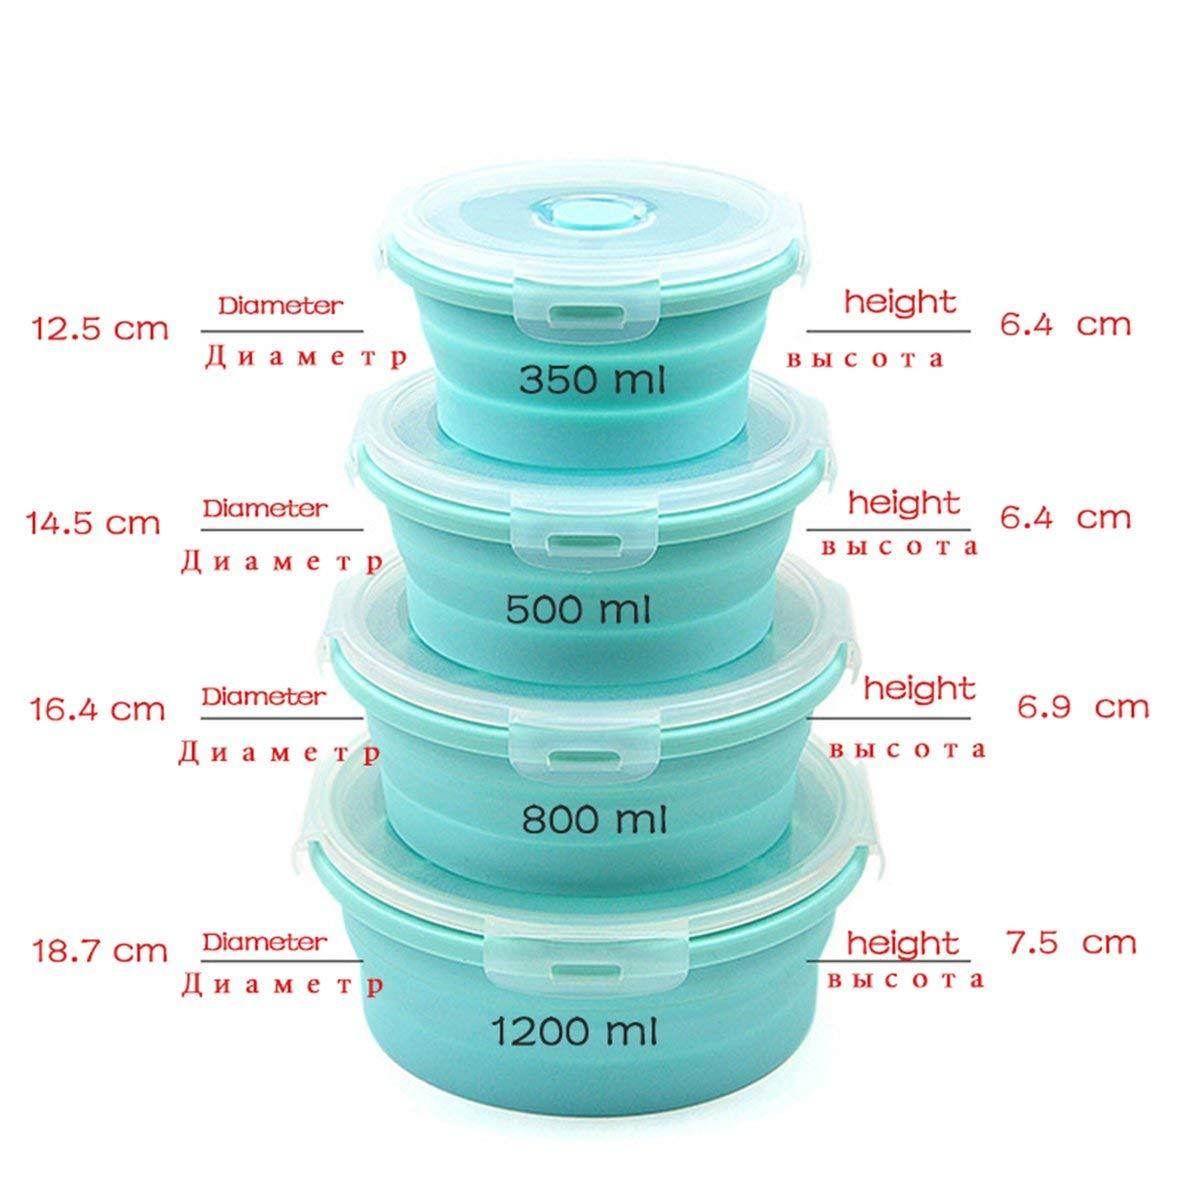 Fiambrera Horno de microondas Fiambrera Colorido para ni/ños contenedor de Alimentos Silicona ecol/ógico port/átil Heaviesk Pr/áctico Plegable